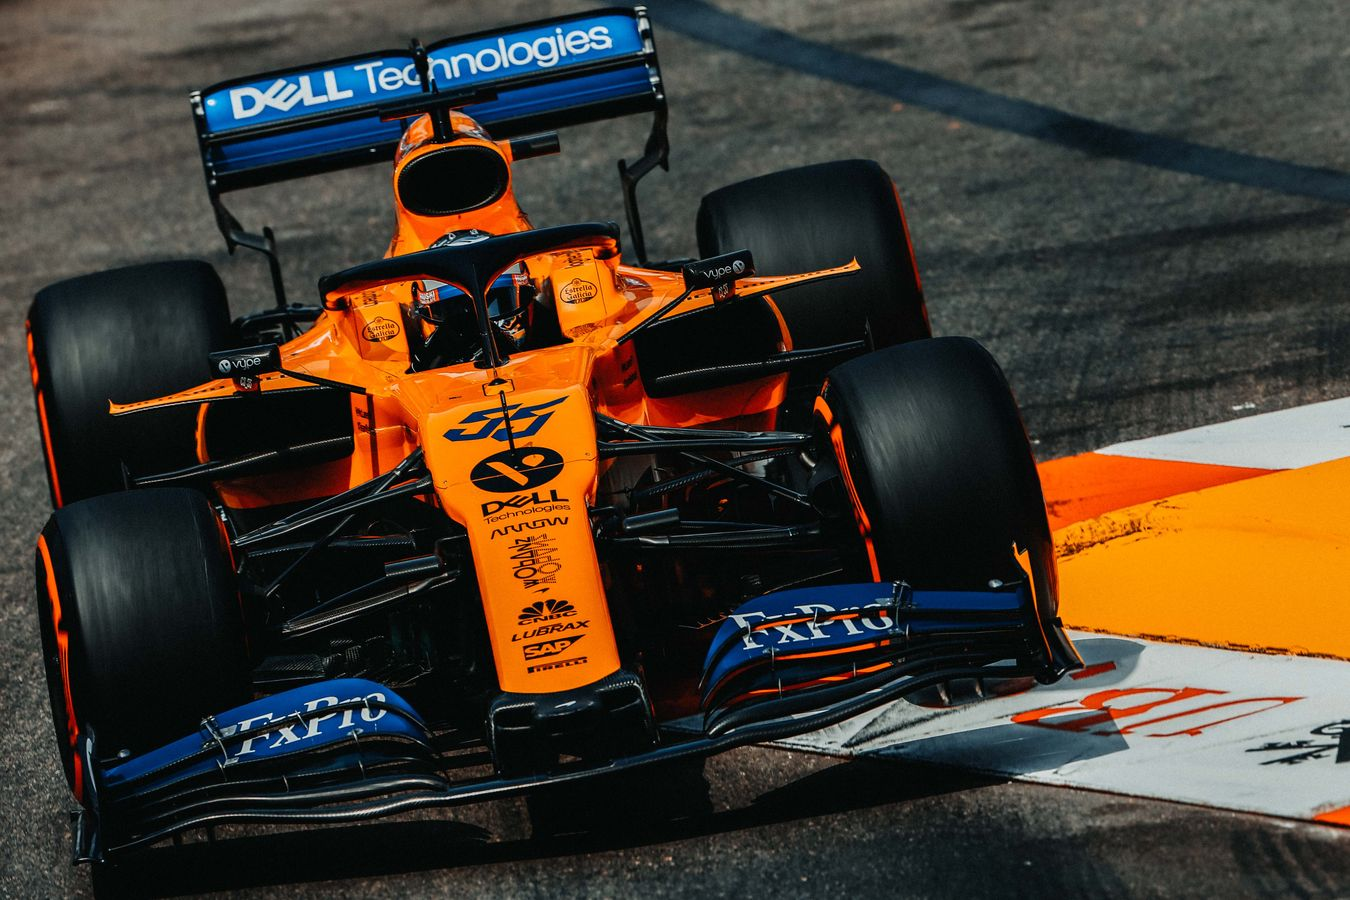 Mclaren Racing 2019 Monaco Grand Prix Qualifying